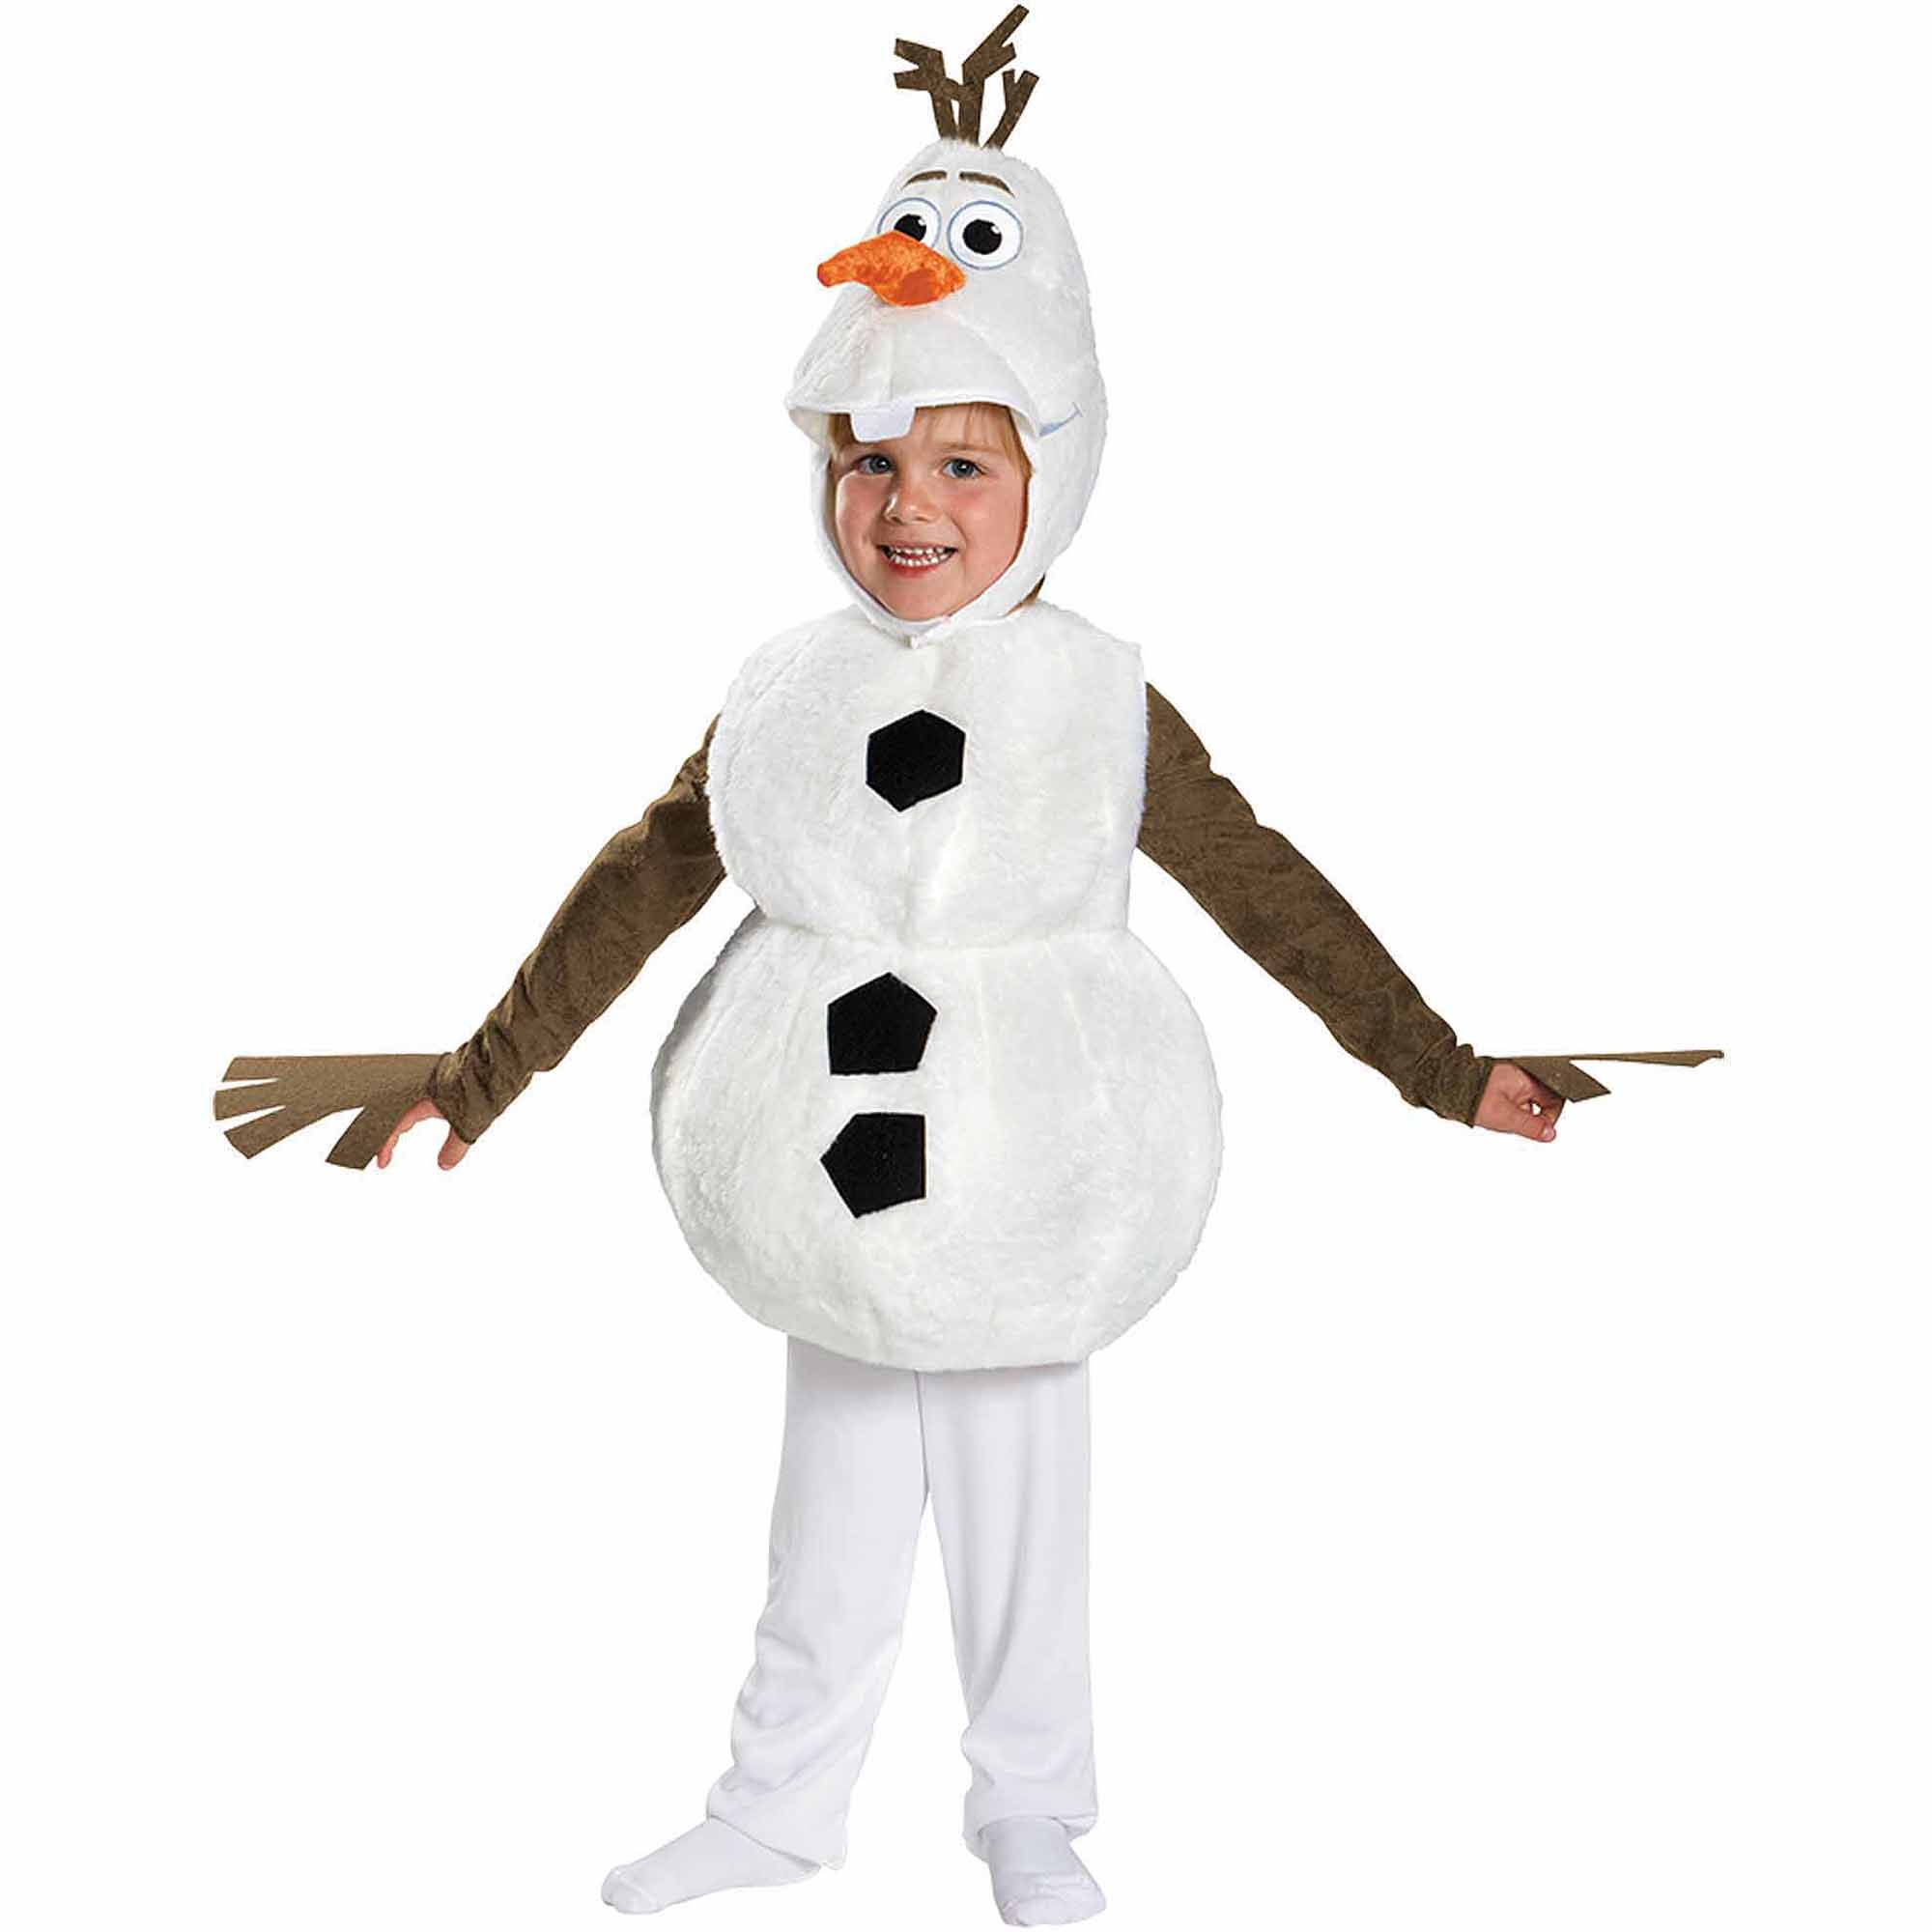 Frozen Olaf Infant Halloween Costume